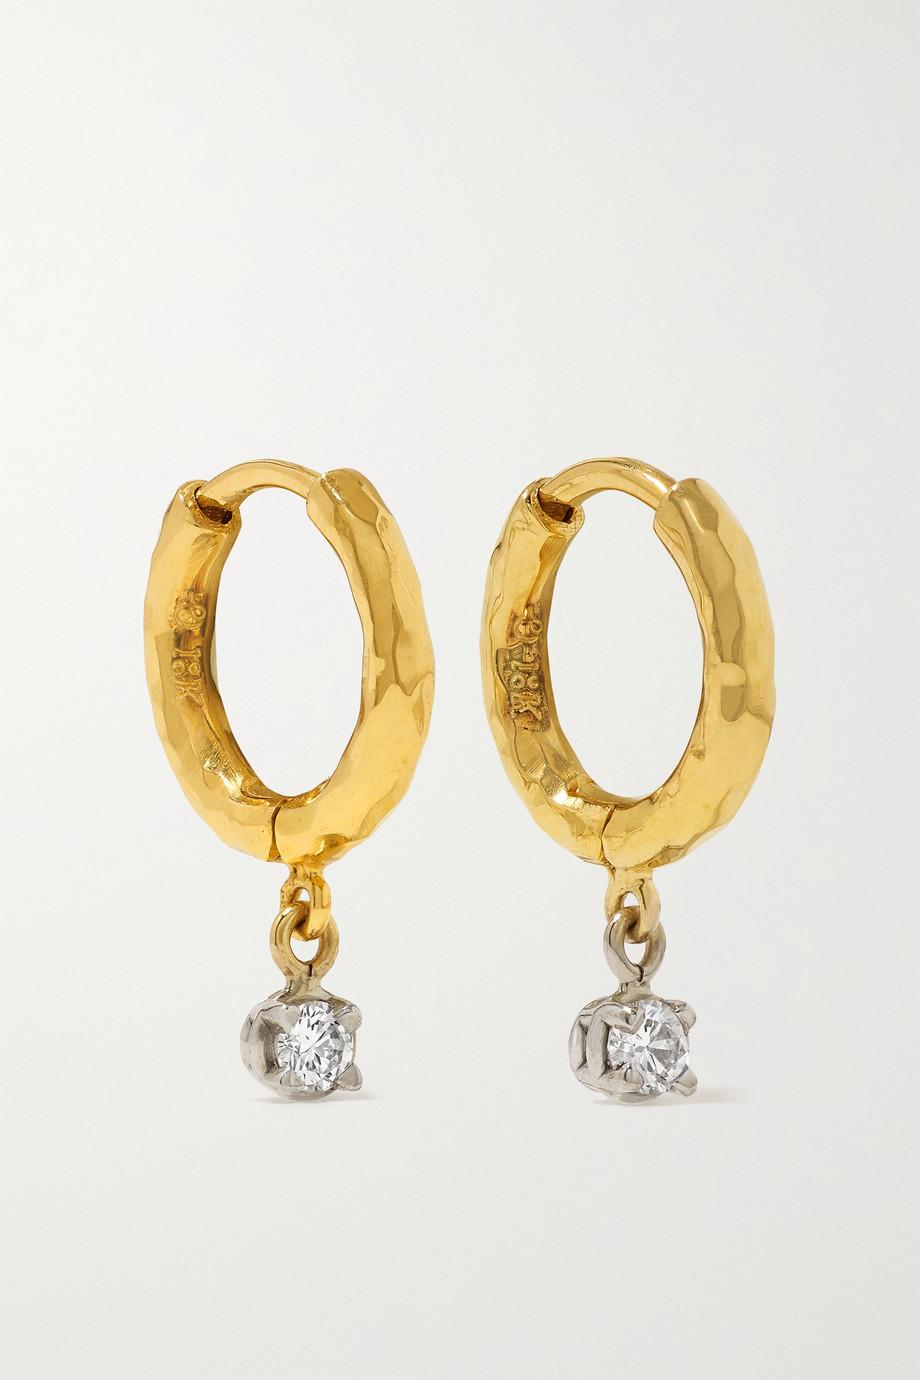 Octavia Elizabeth + NET SUSTAIN Micro Gabby 18-karat recycled gold diamond hoop earrings